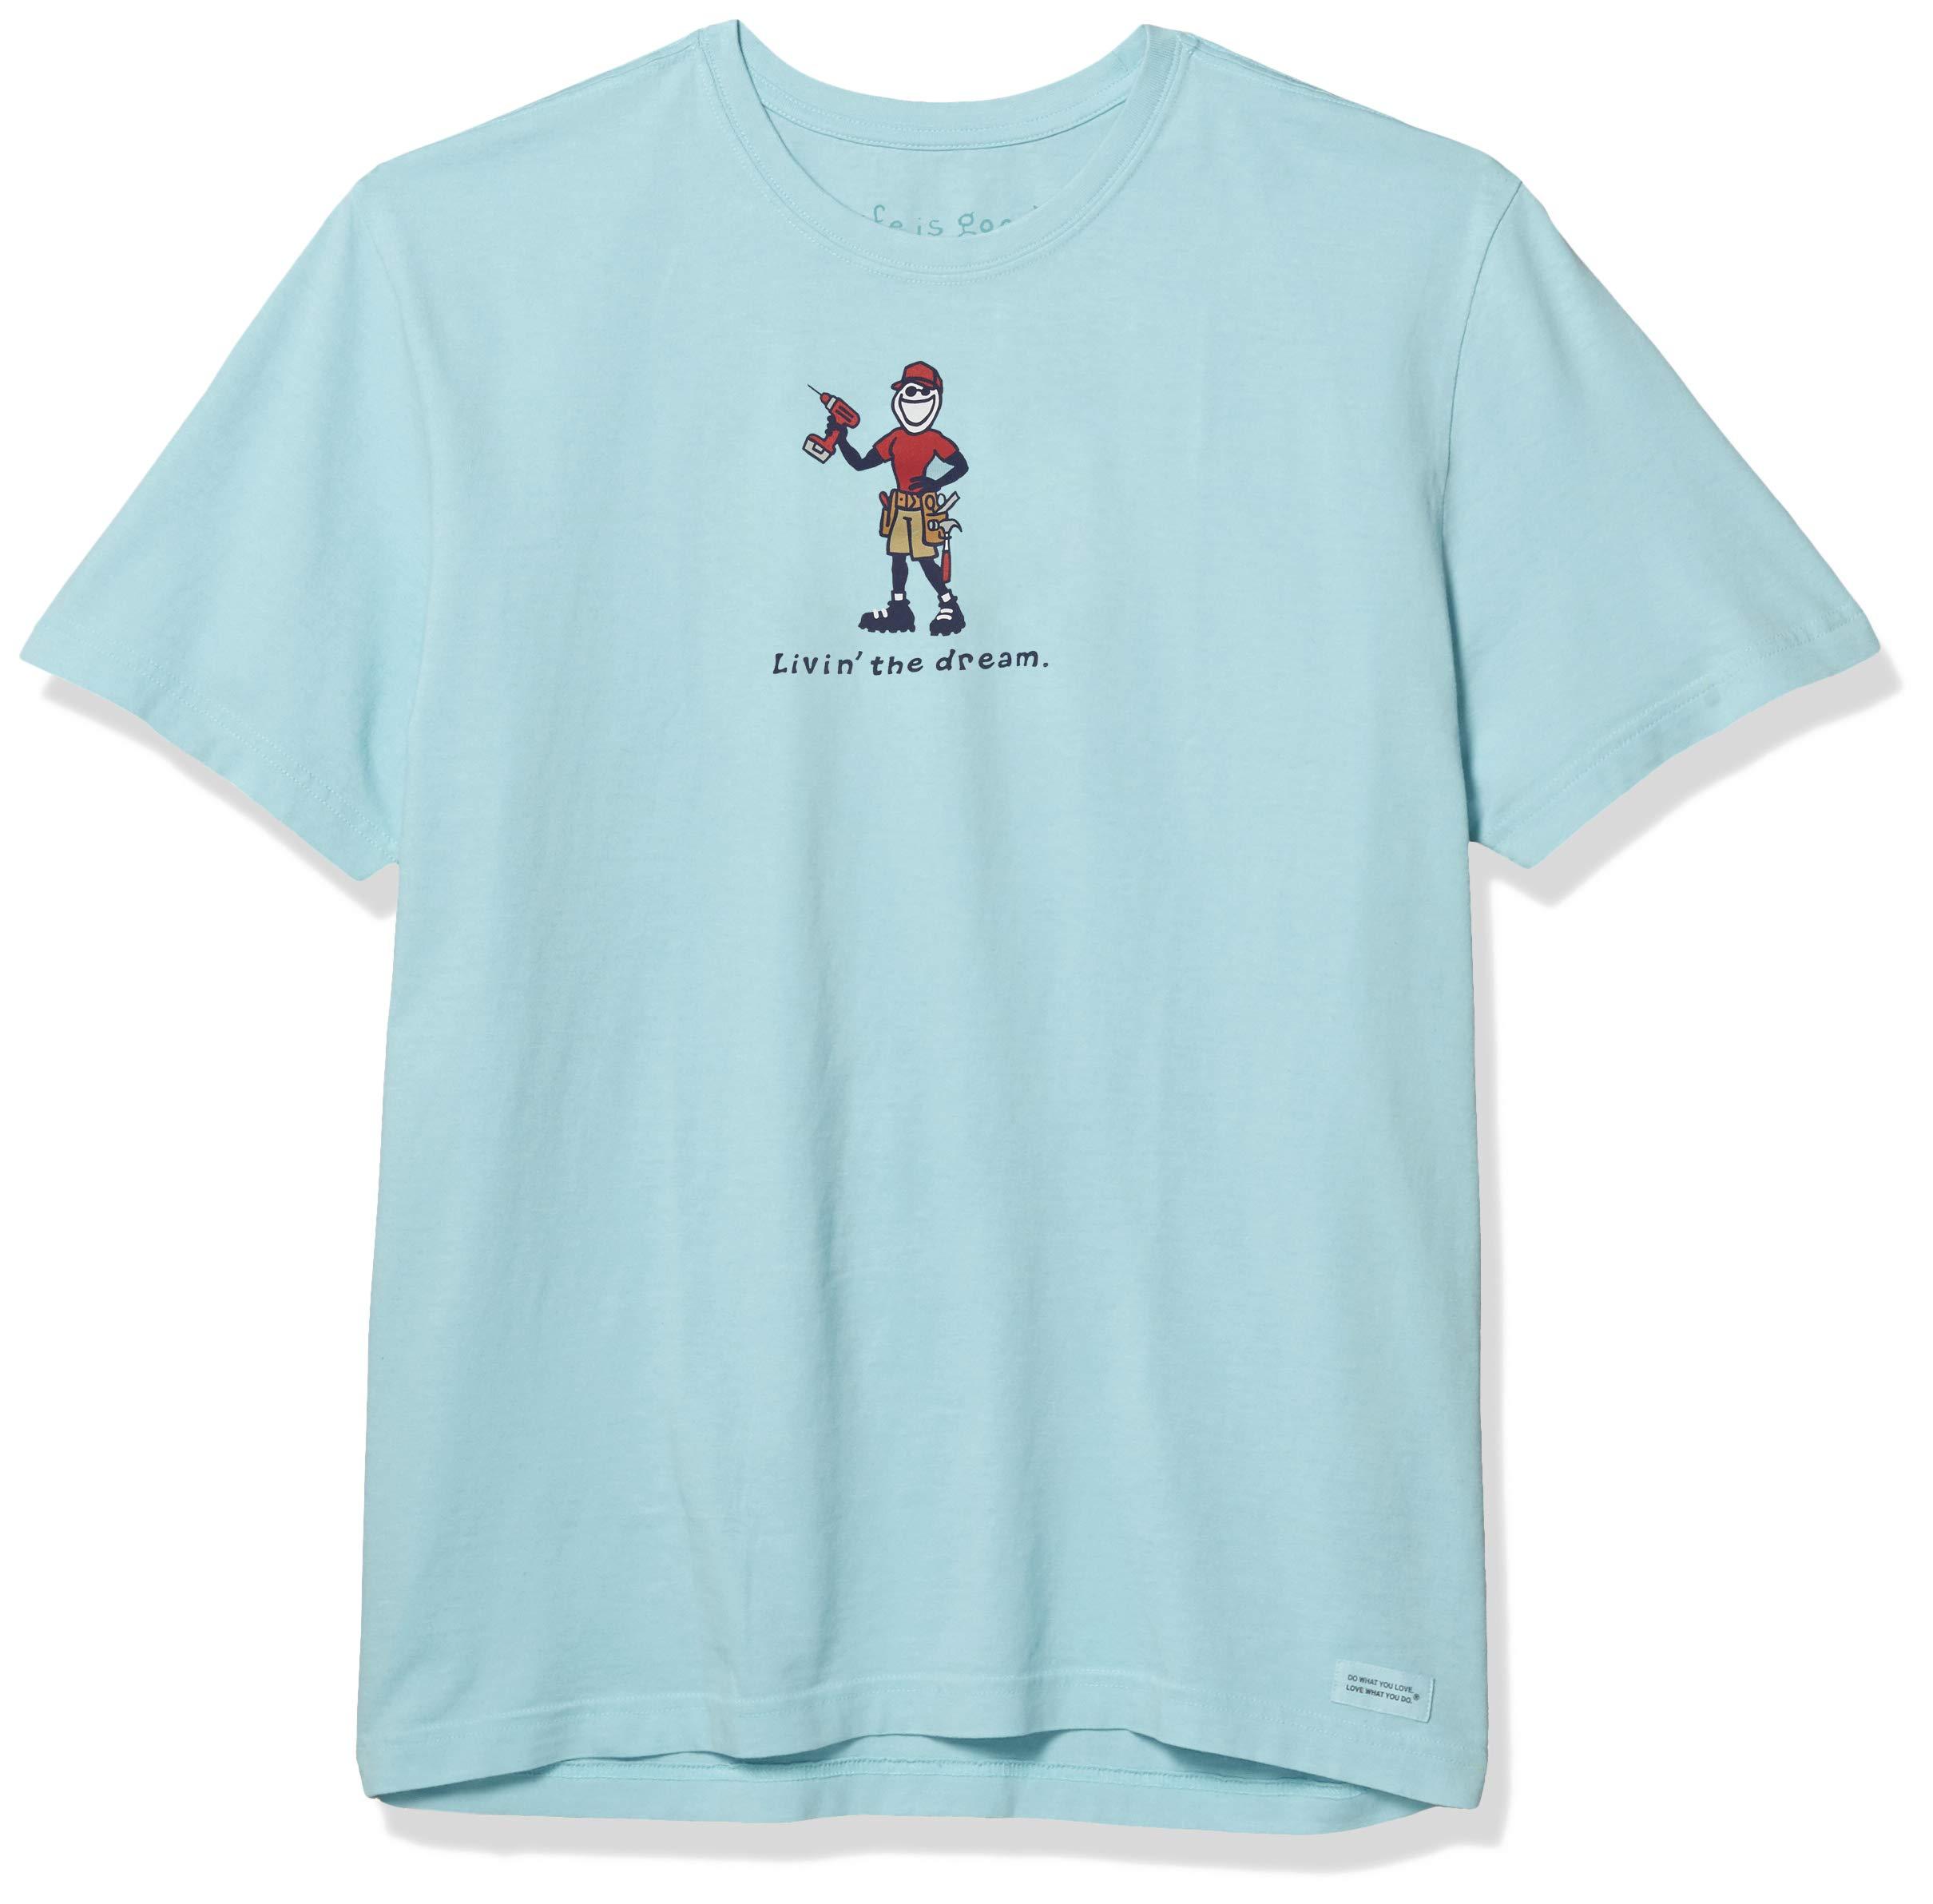 Unisex Adult S Vintage Work Jake Shirts